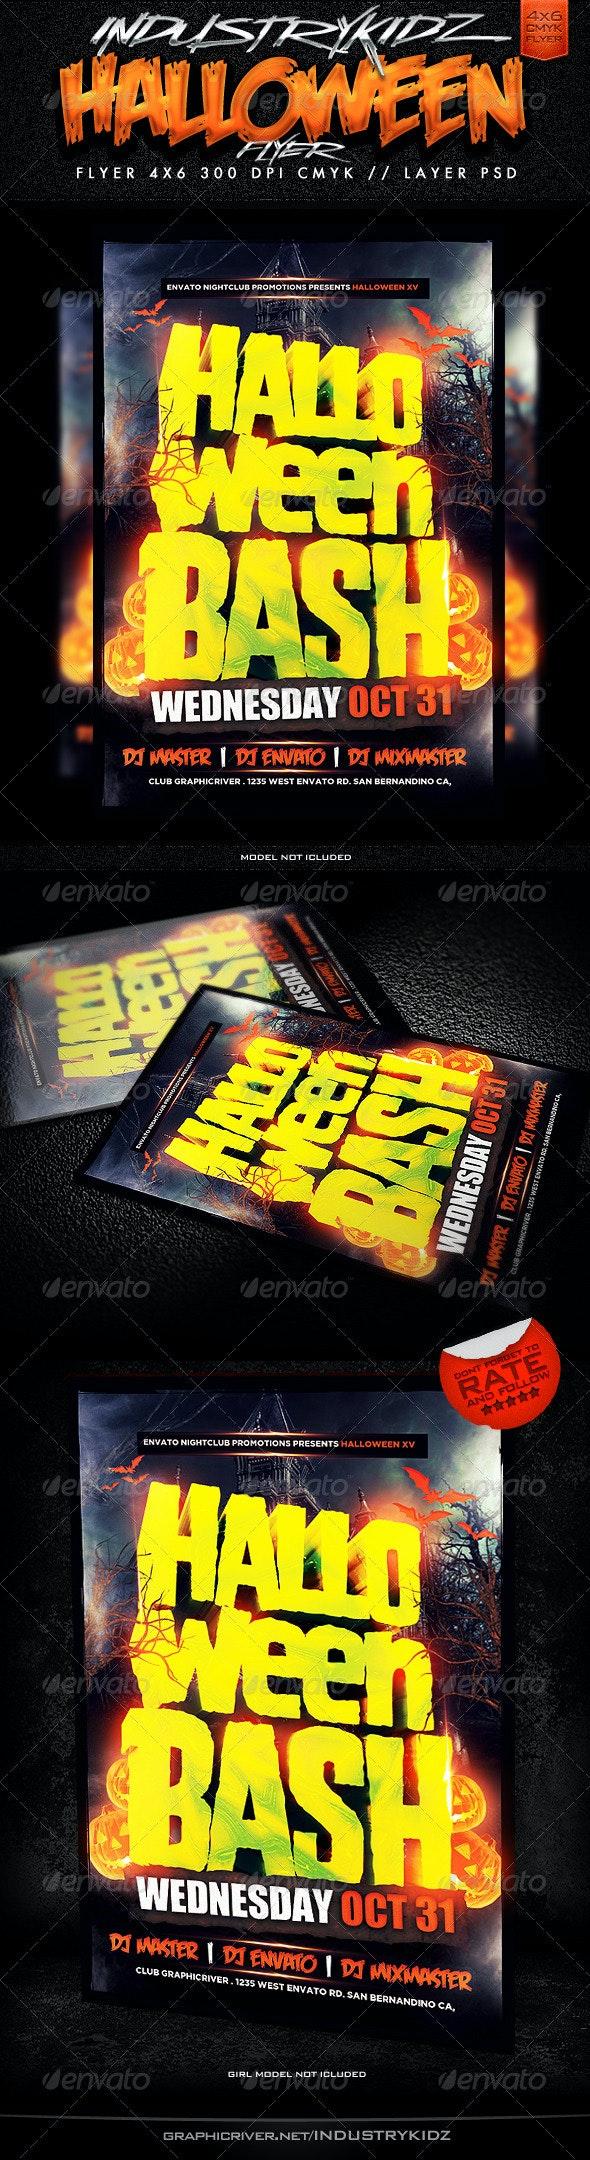 Halloween Bash Flyer Template  - Holidays Events